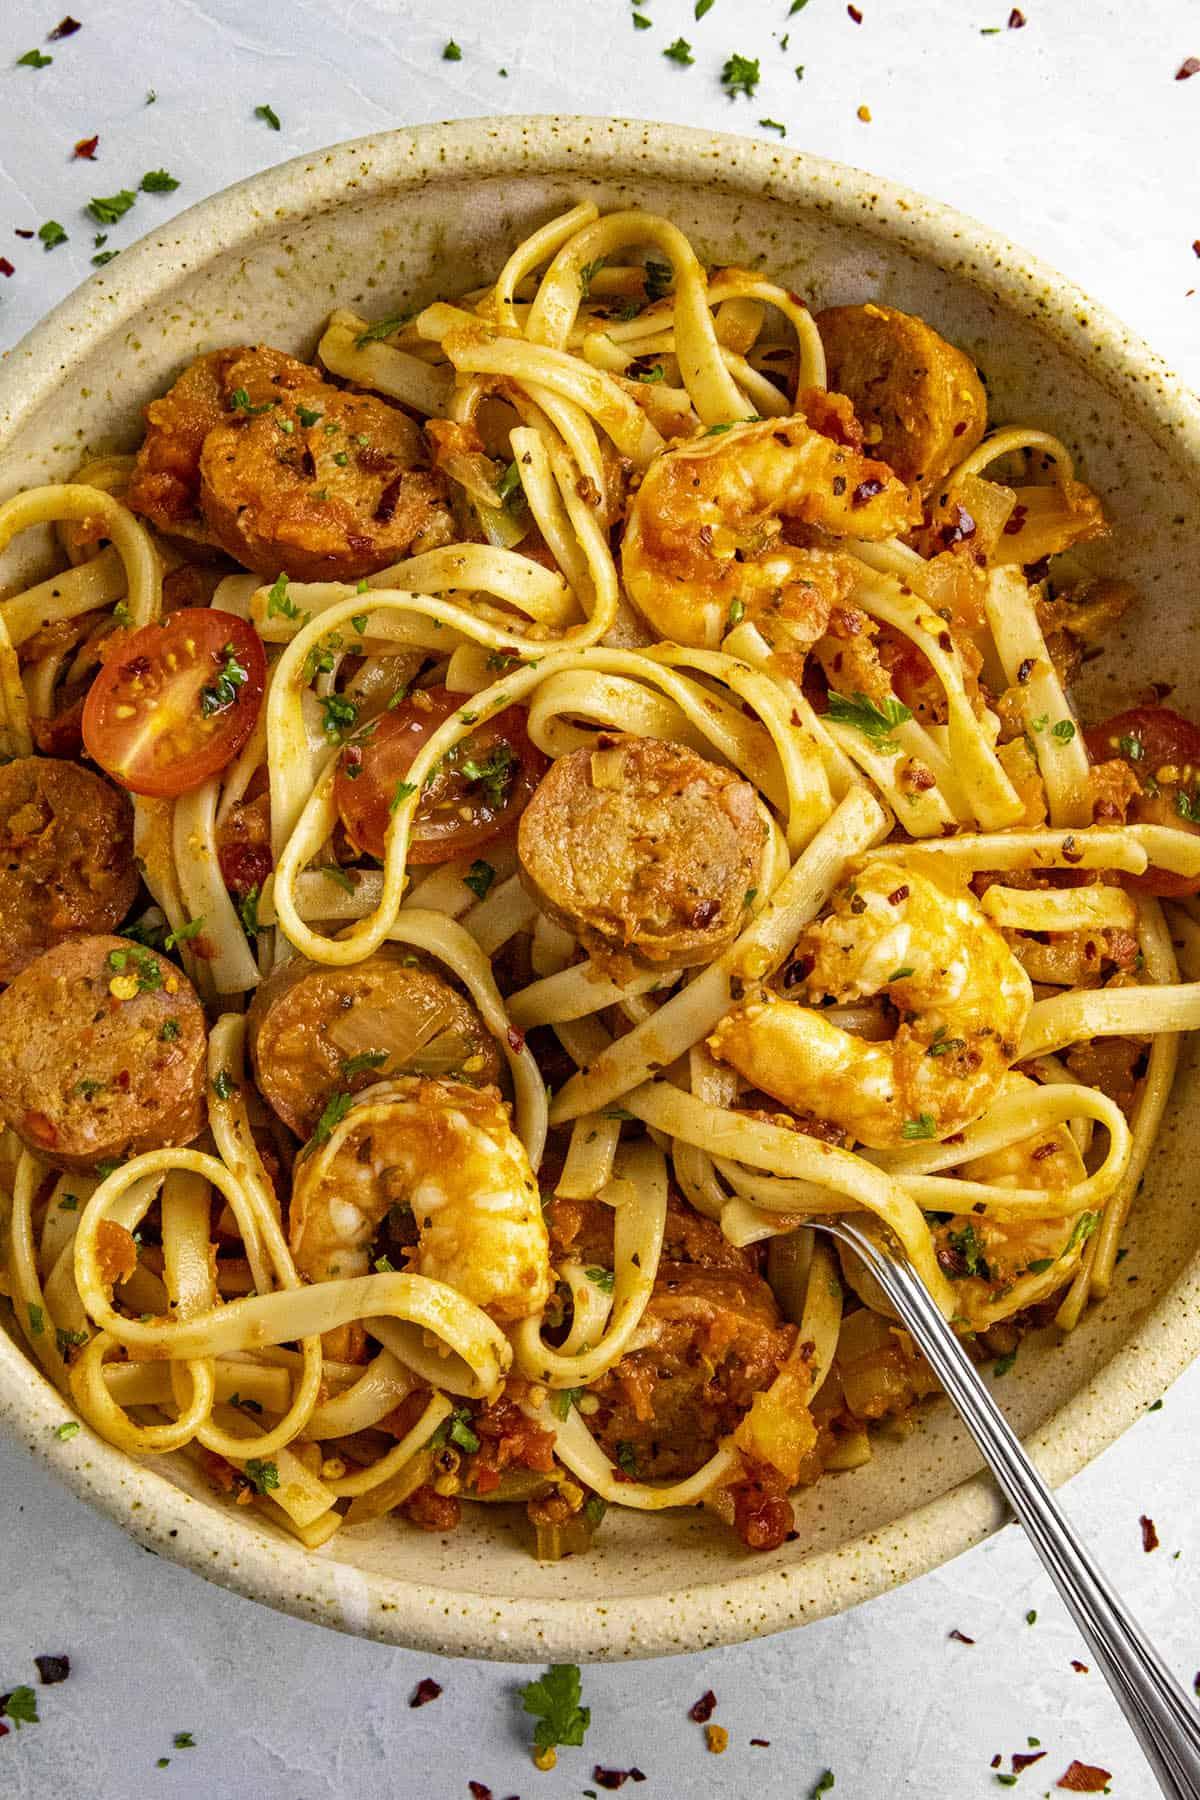 Cajun pasta in a bowl